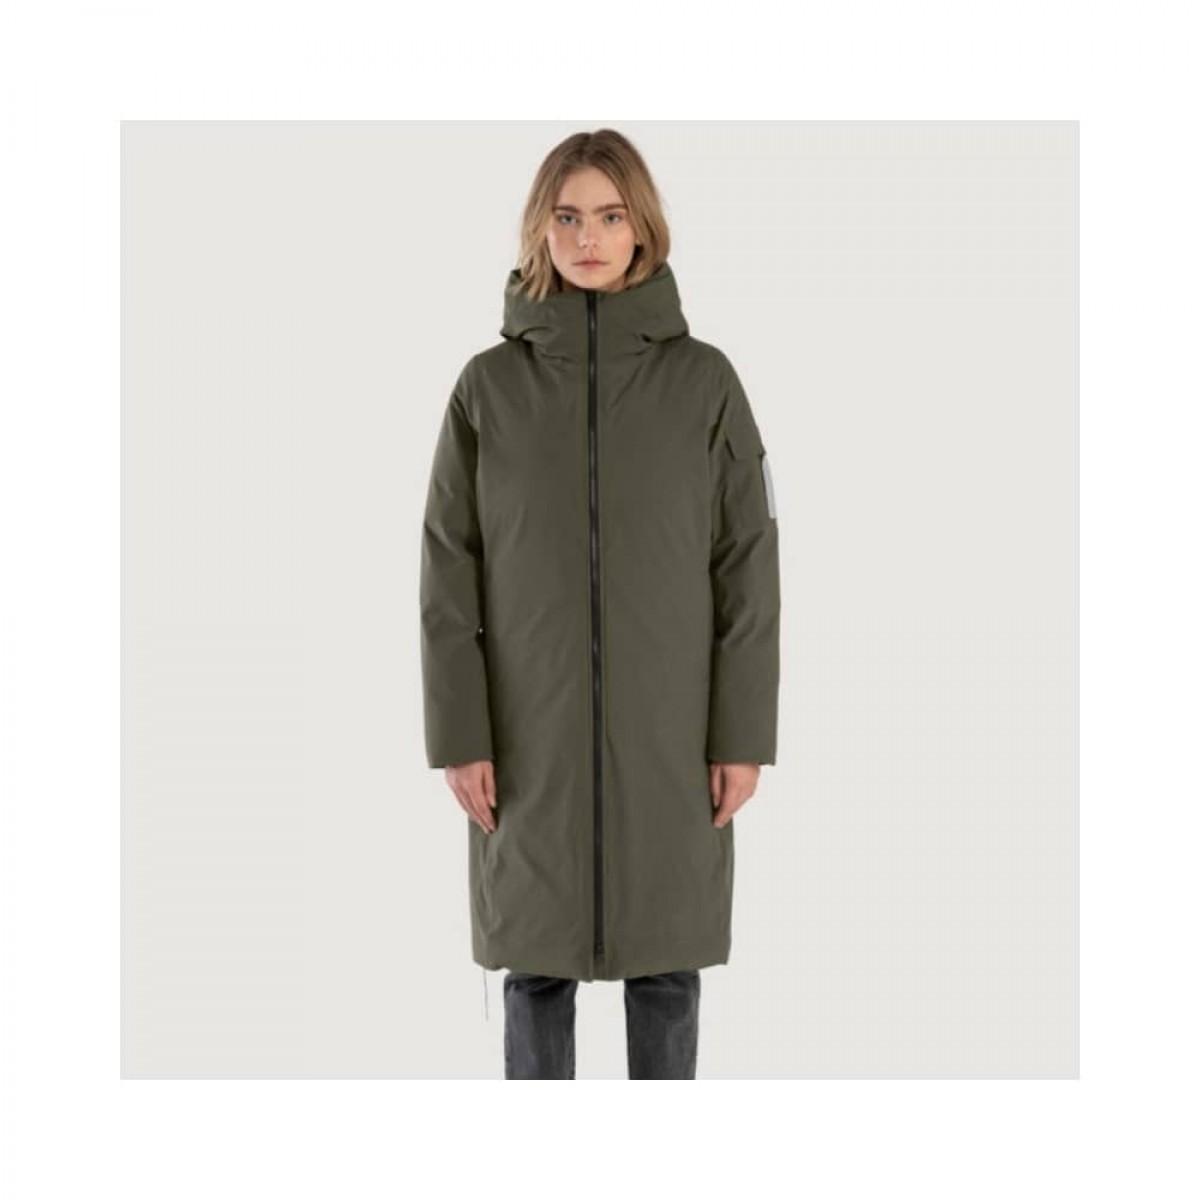 bjorli jacket - green - model front